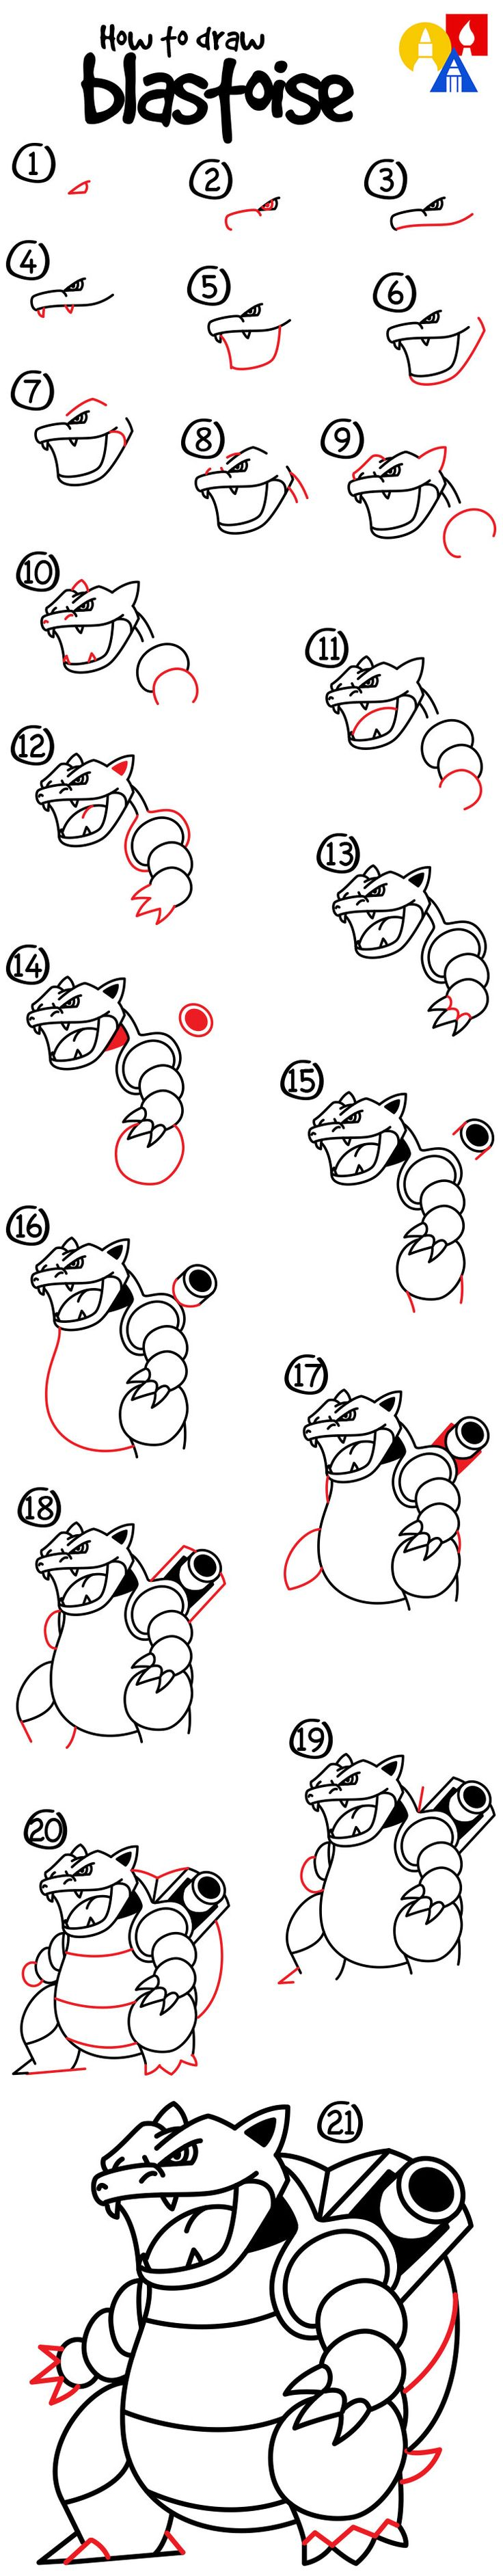 How to draw Blastoise from Pokemon!